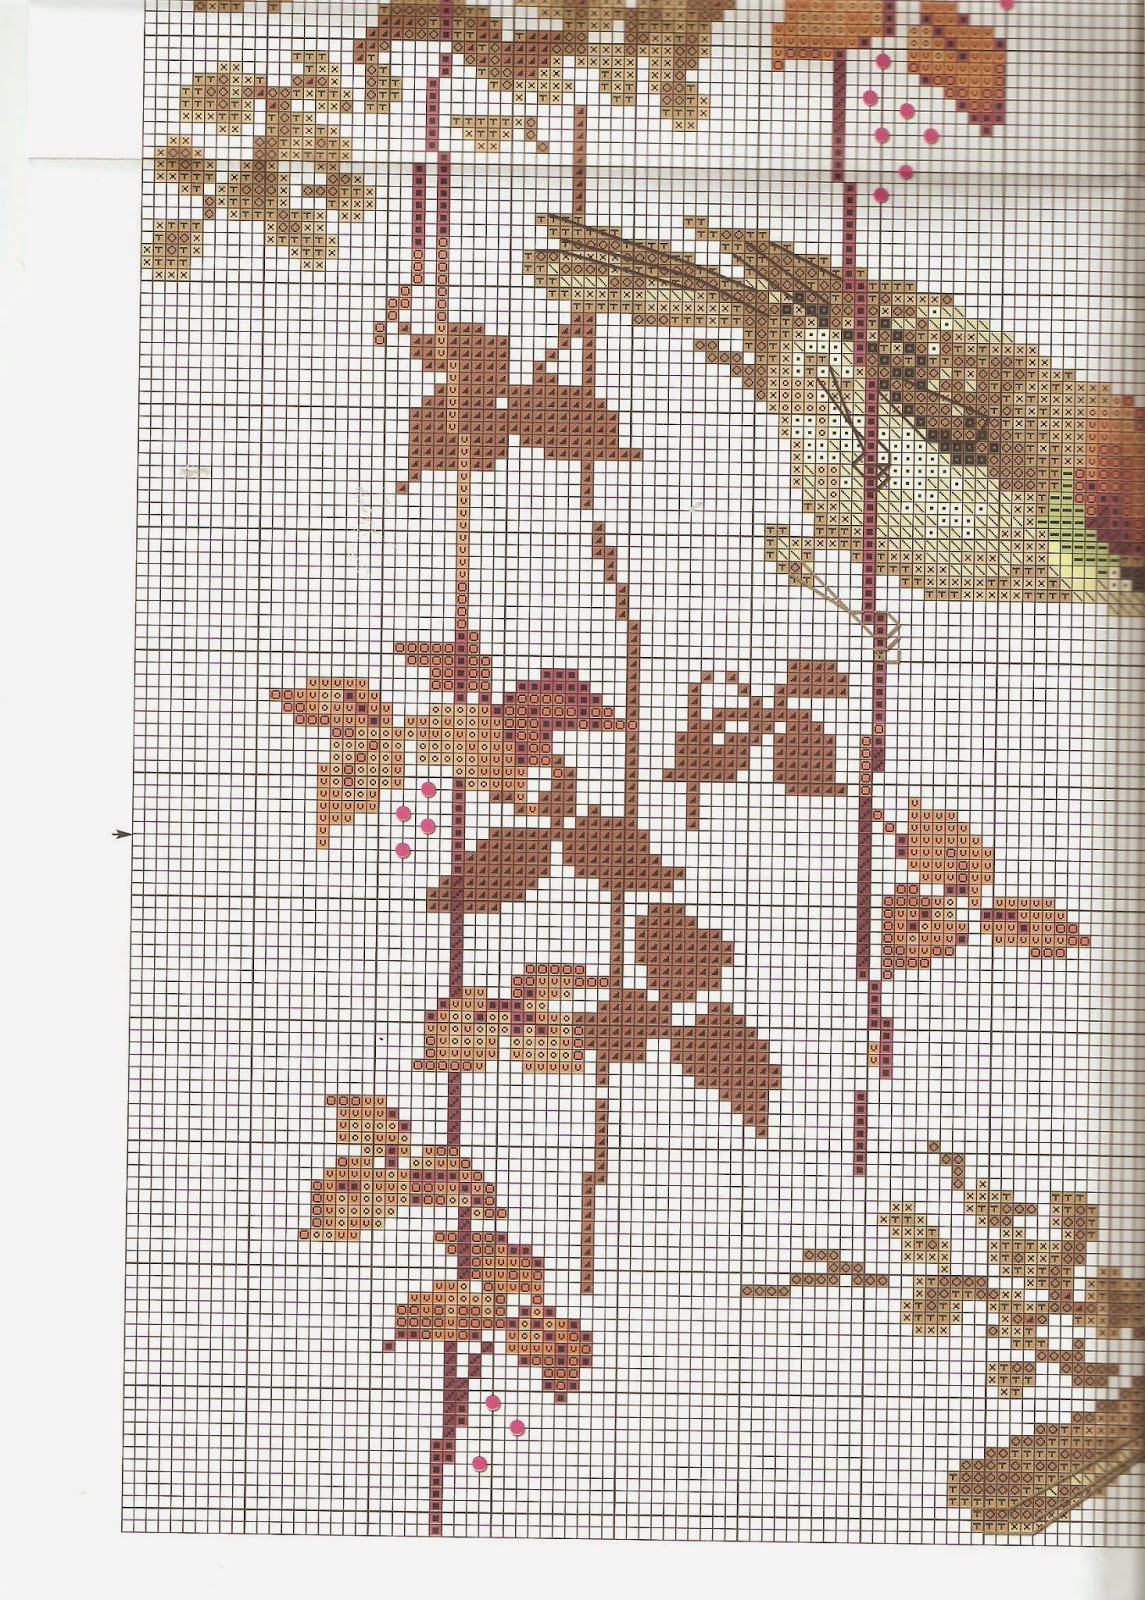 риолис подушка 720 схема